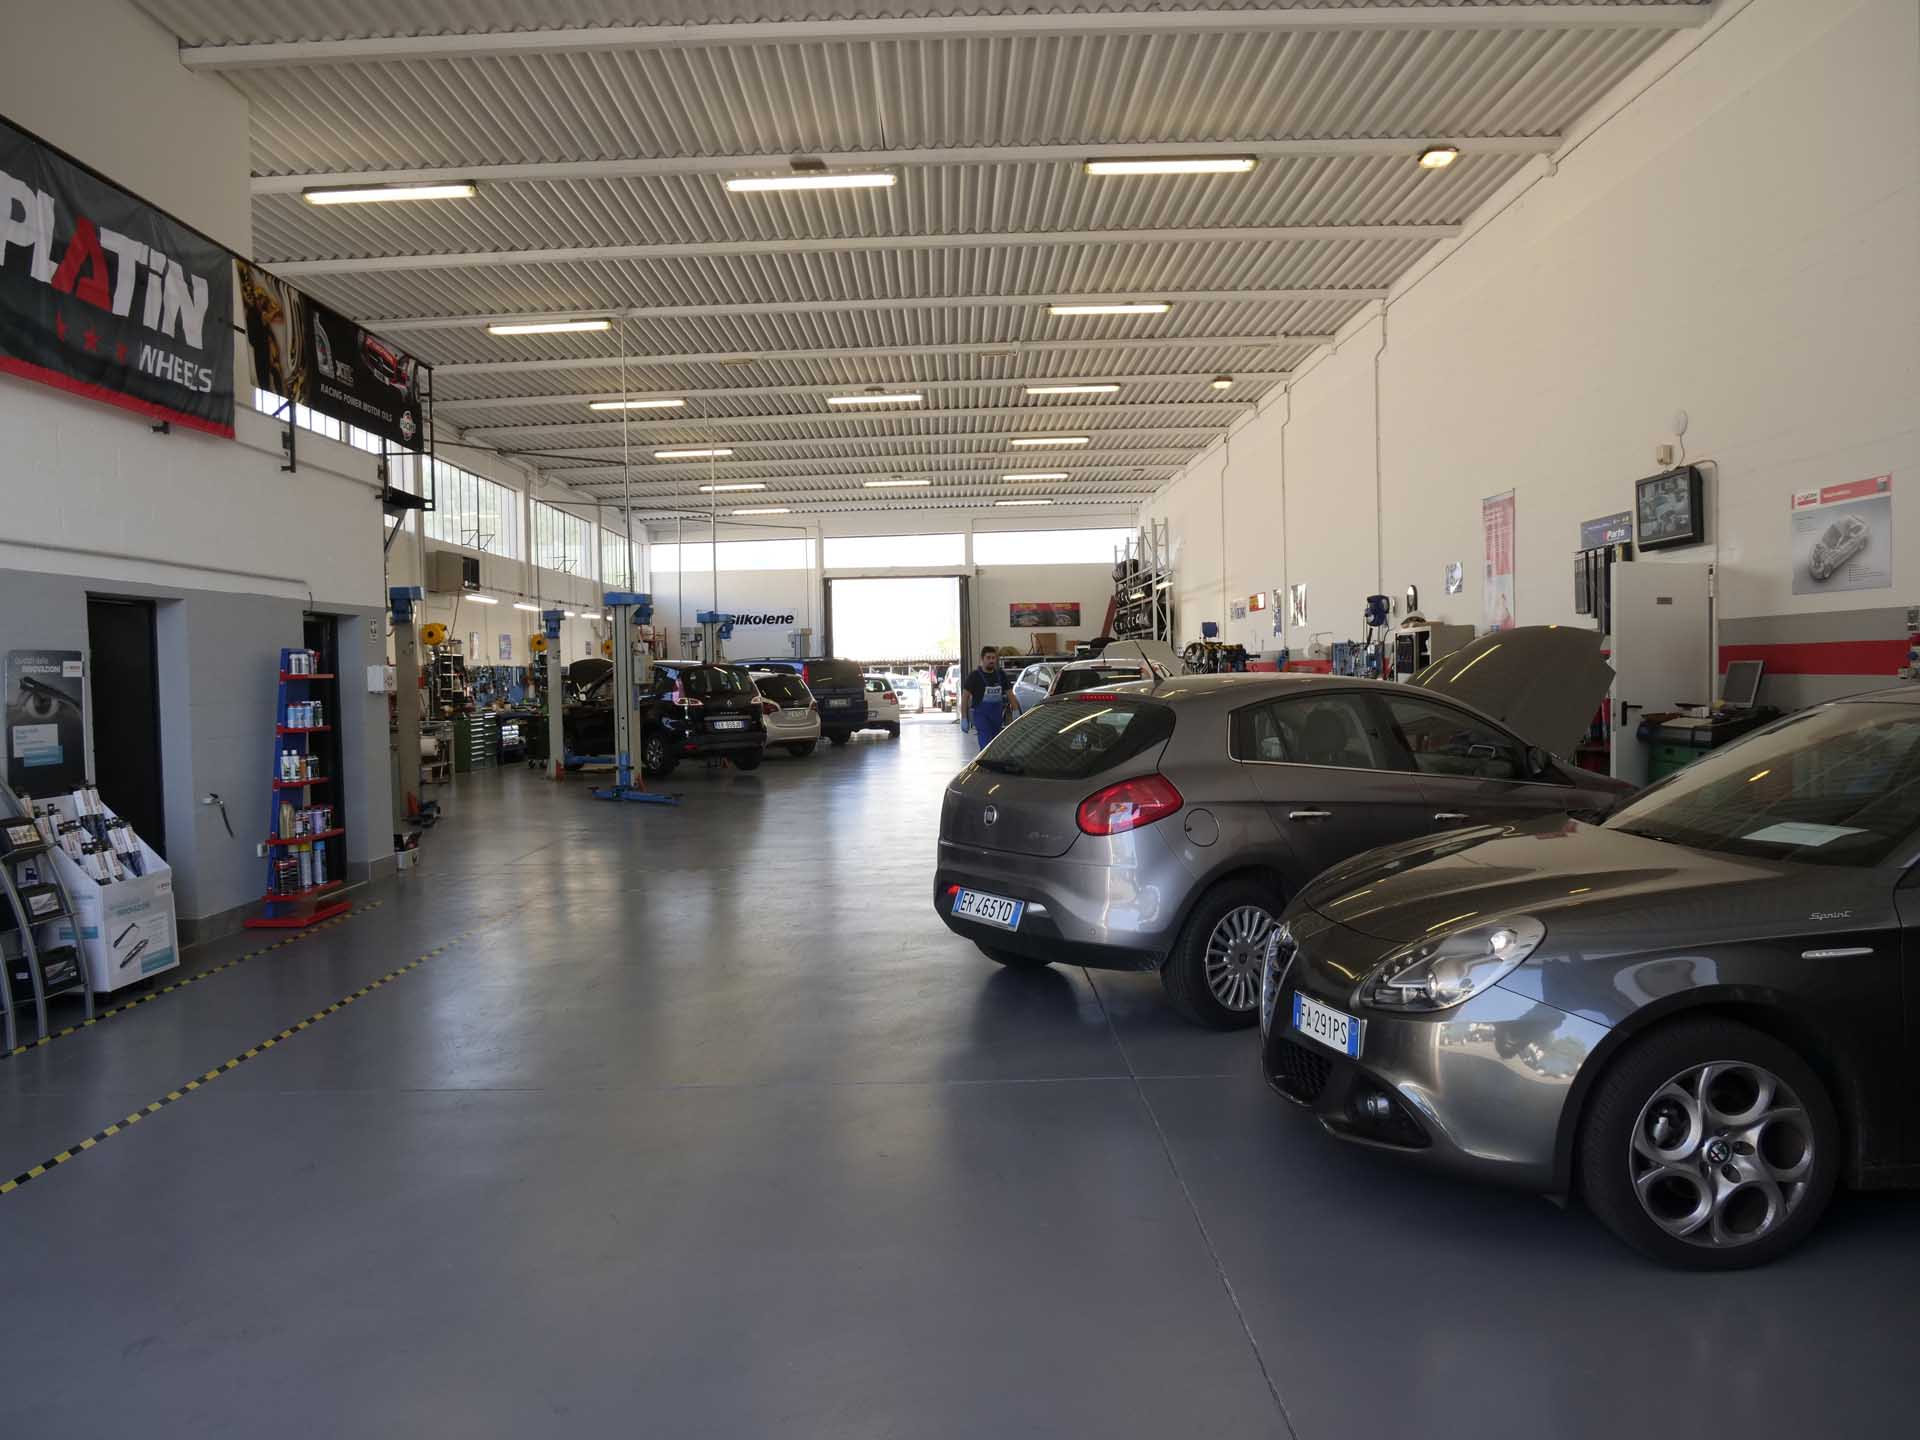 Autofficina Fabris Tagliandi di manutenzione su vetture multimarca